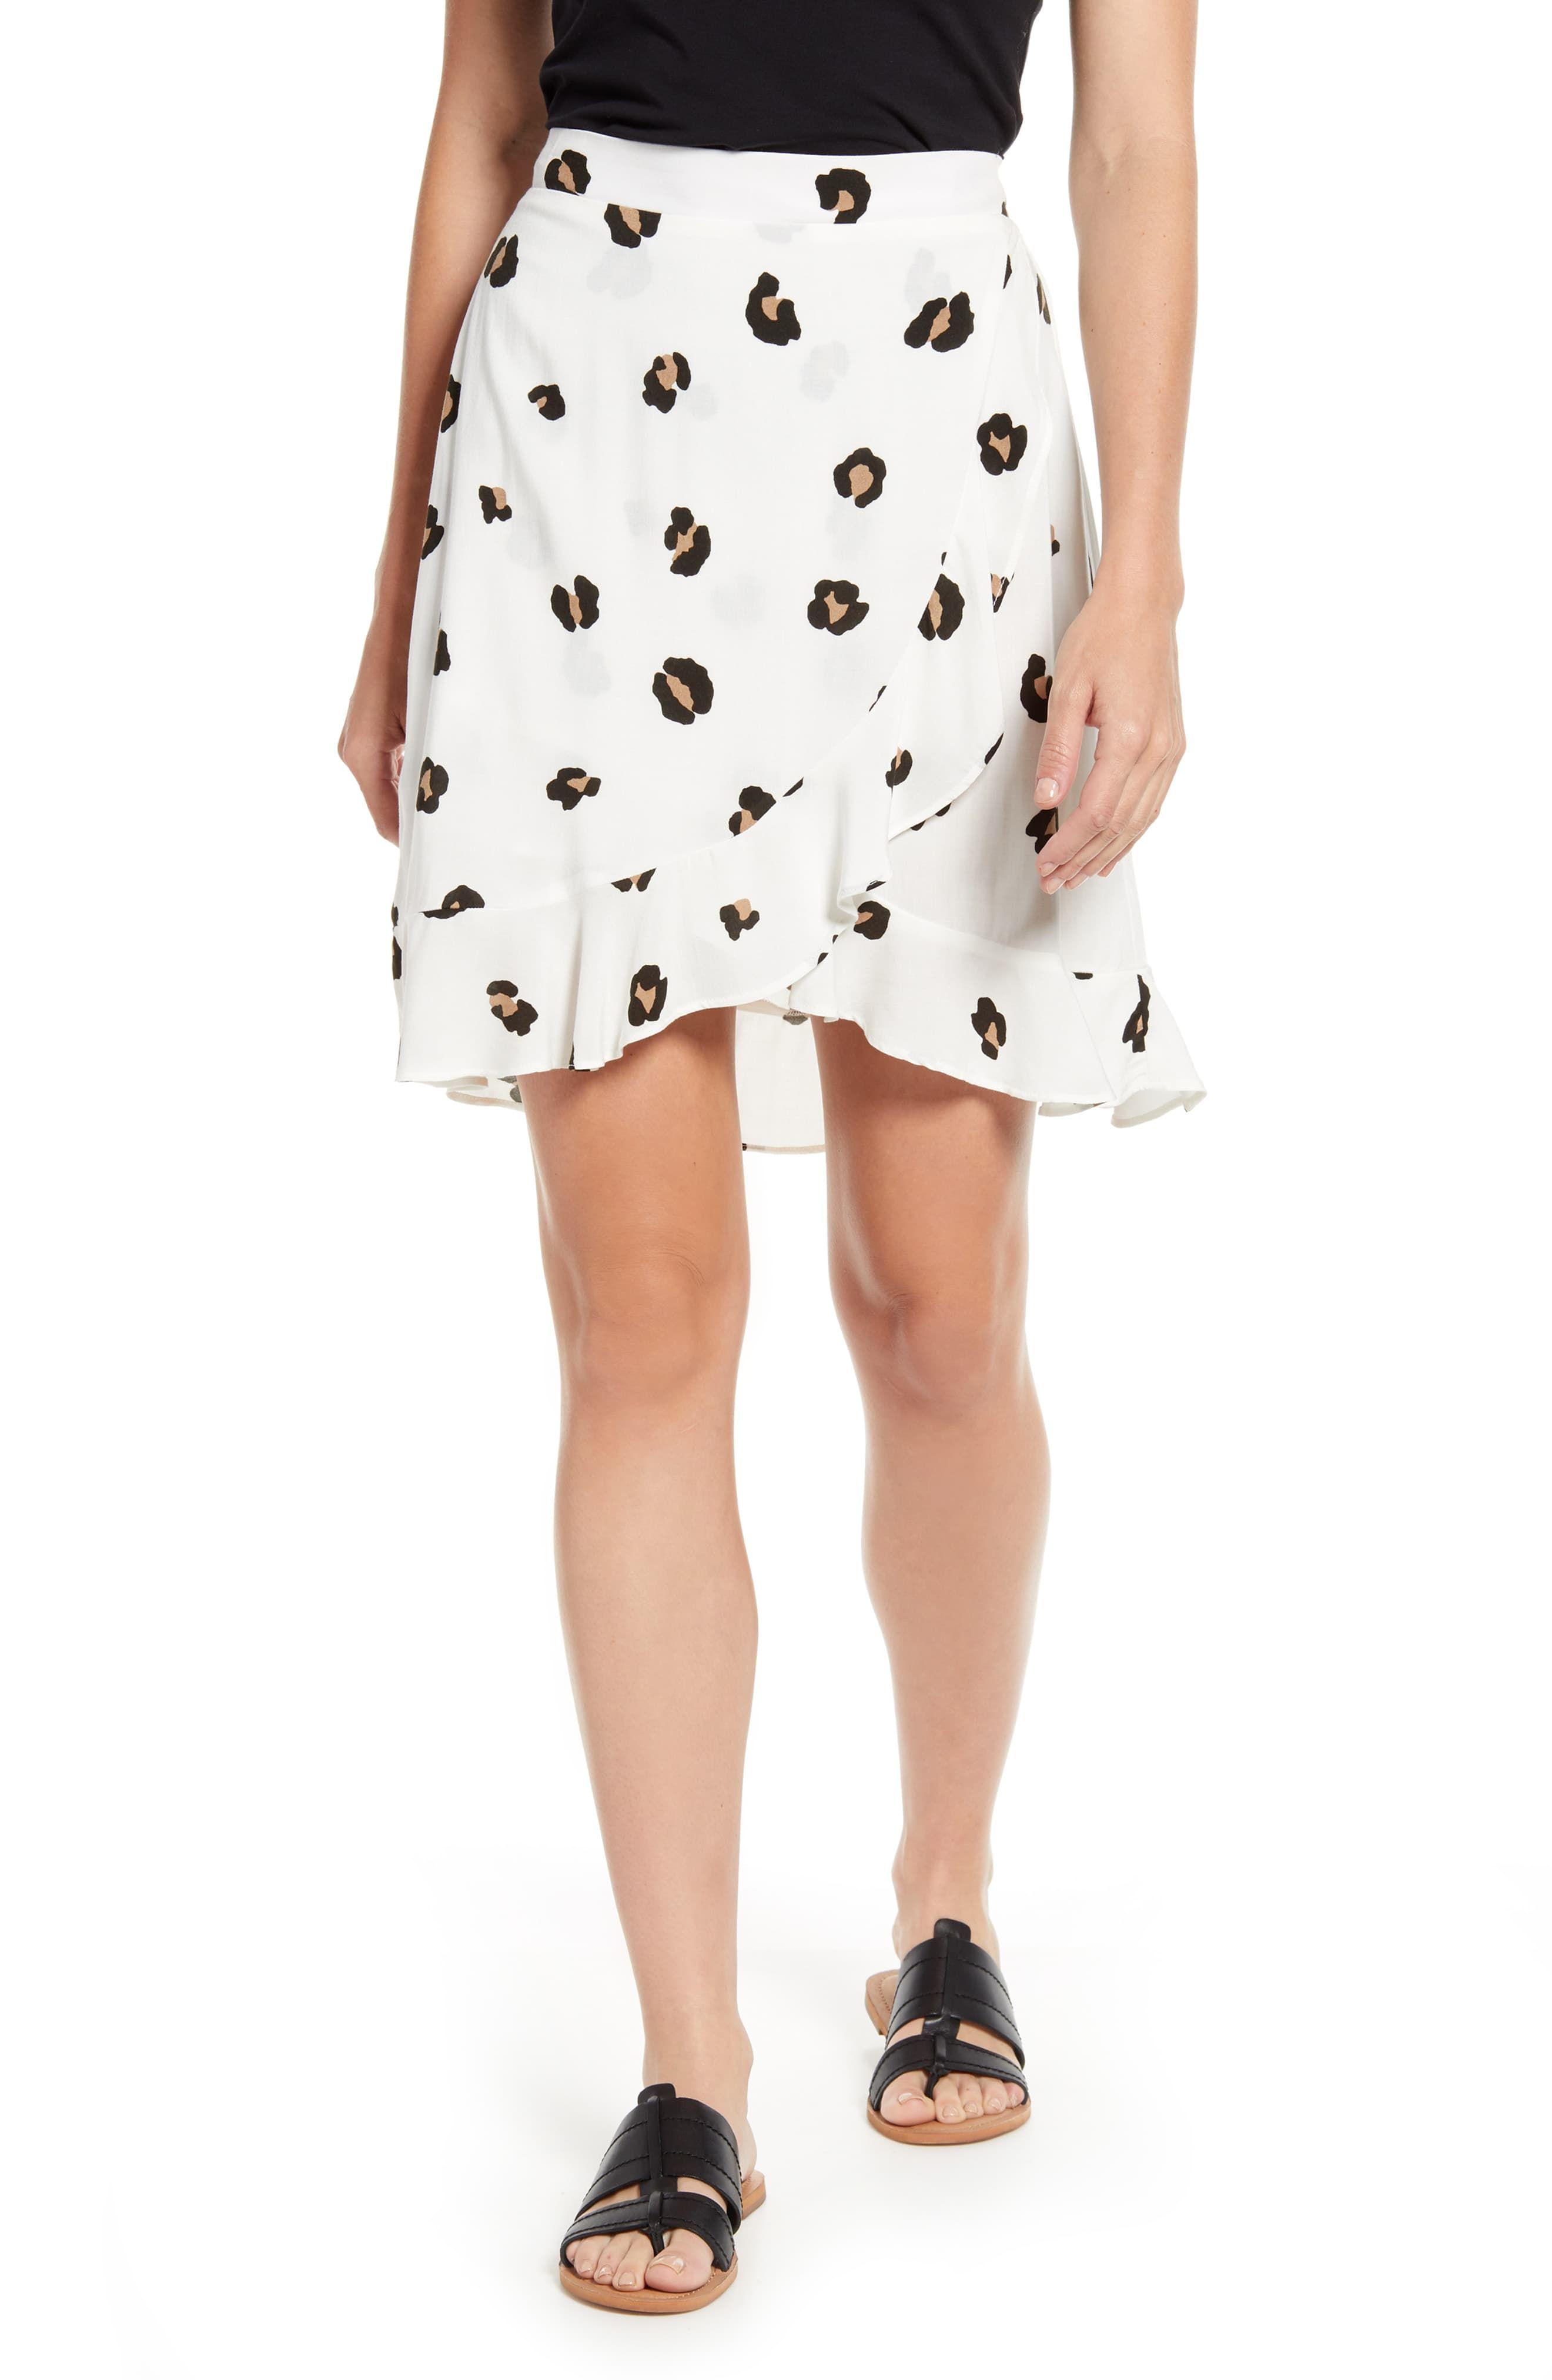 Womens petite size skirts — pic 9